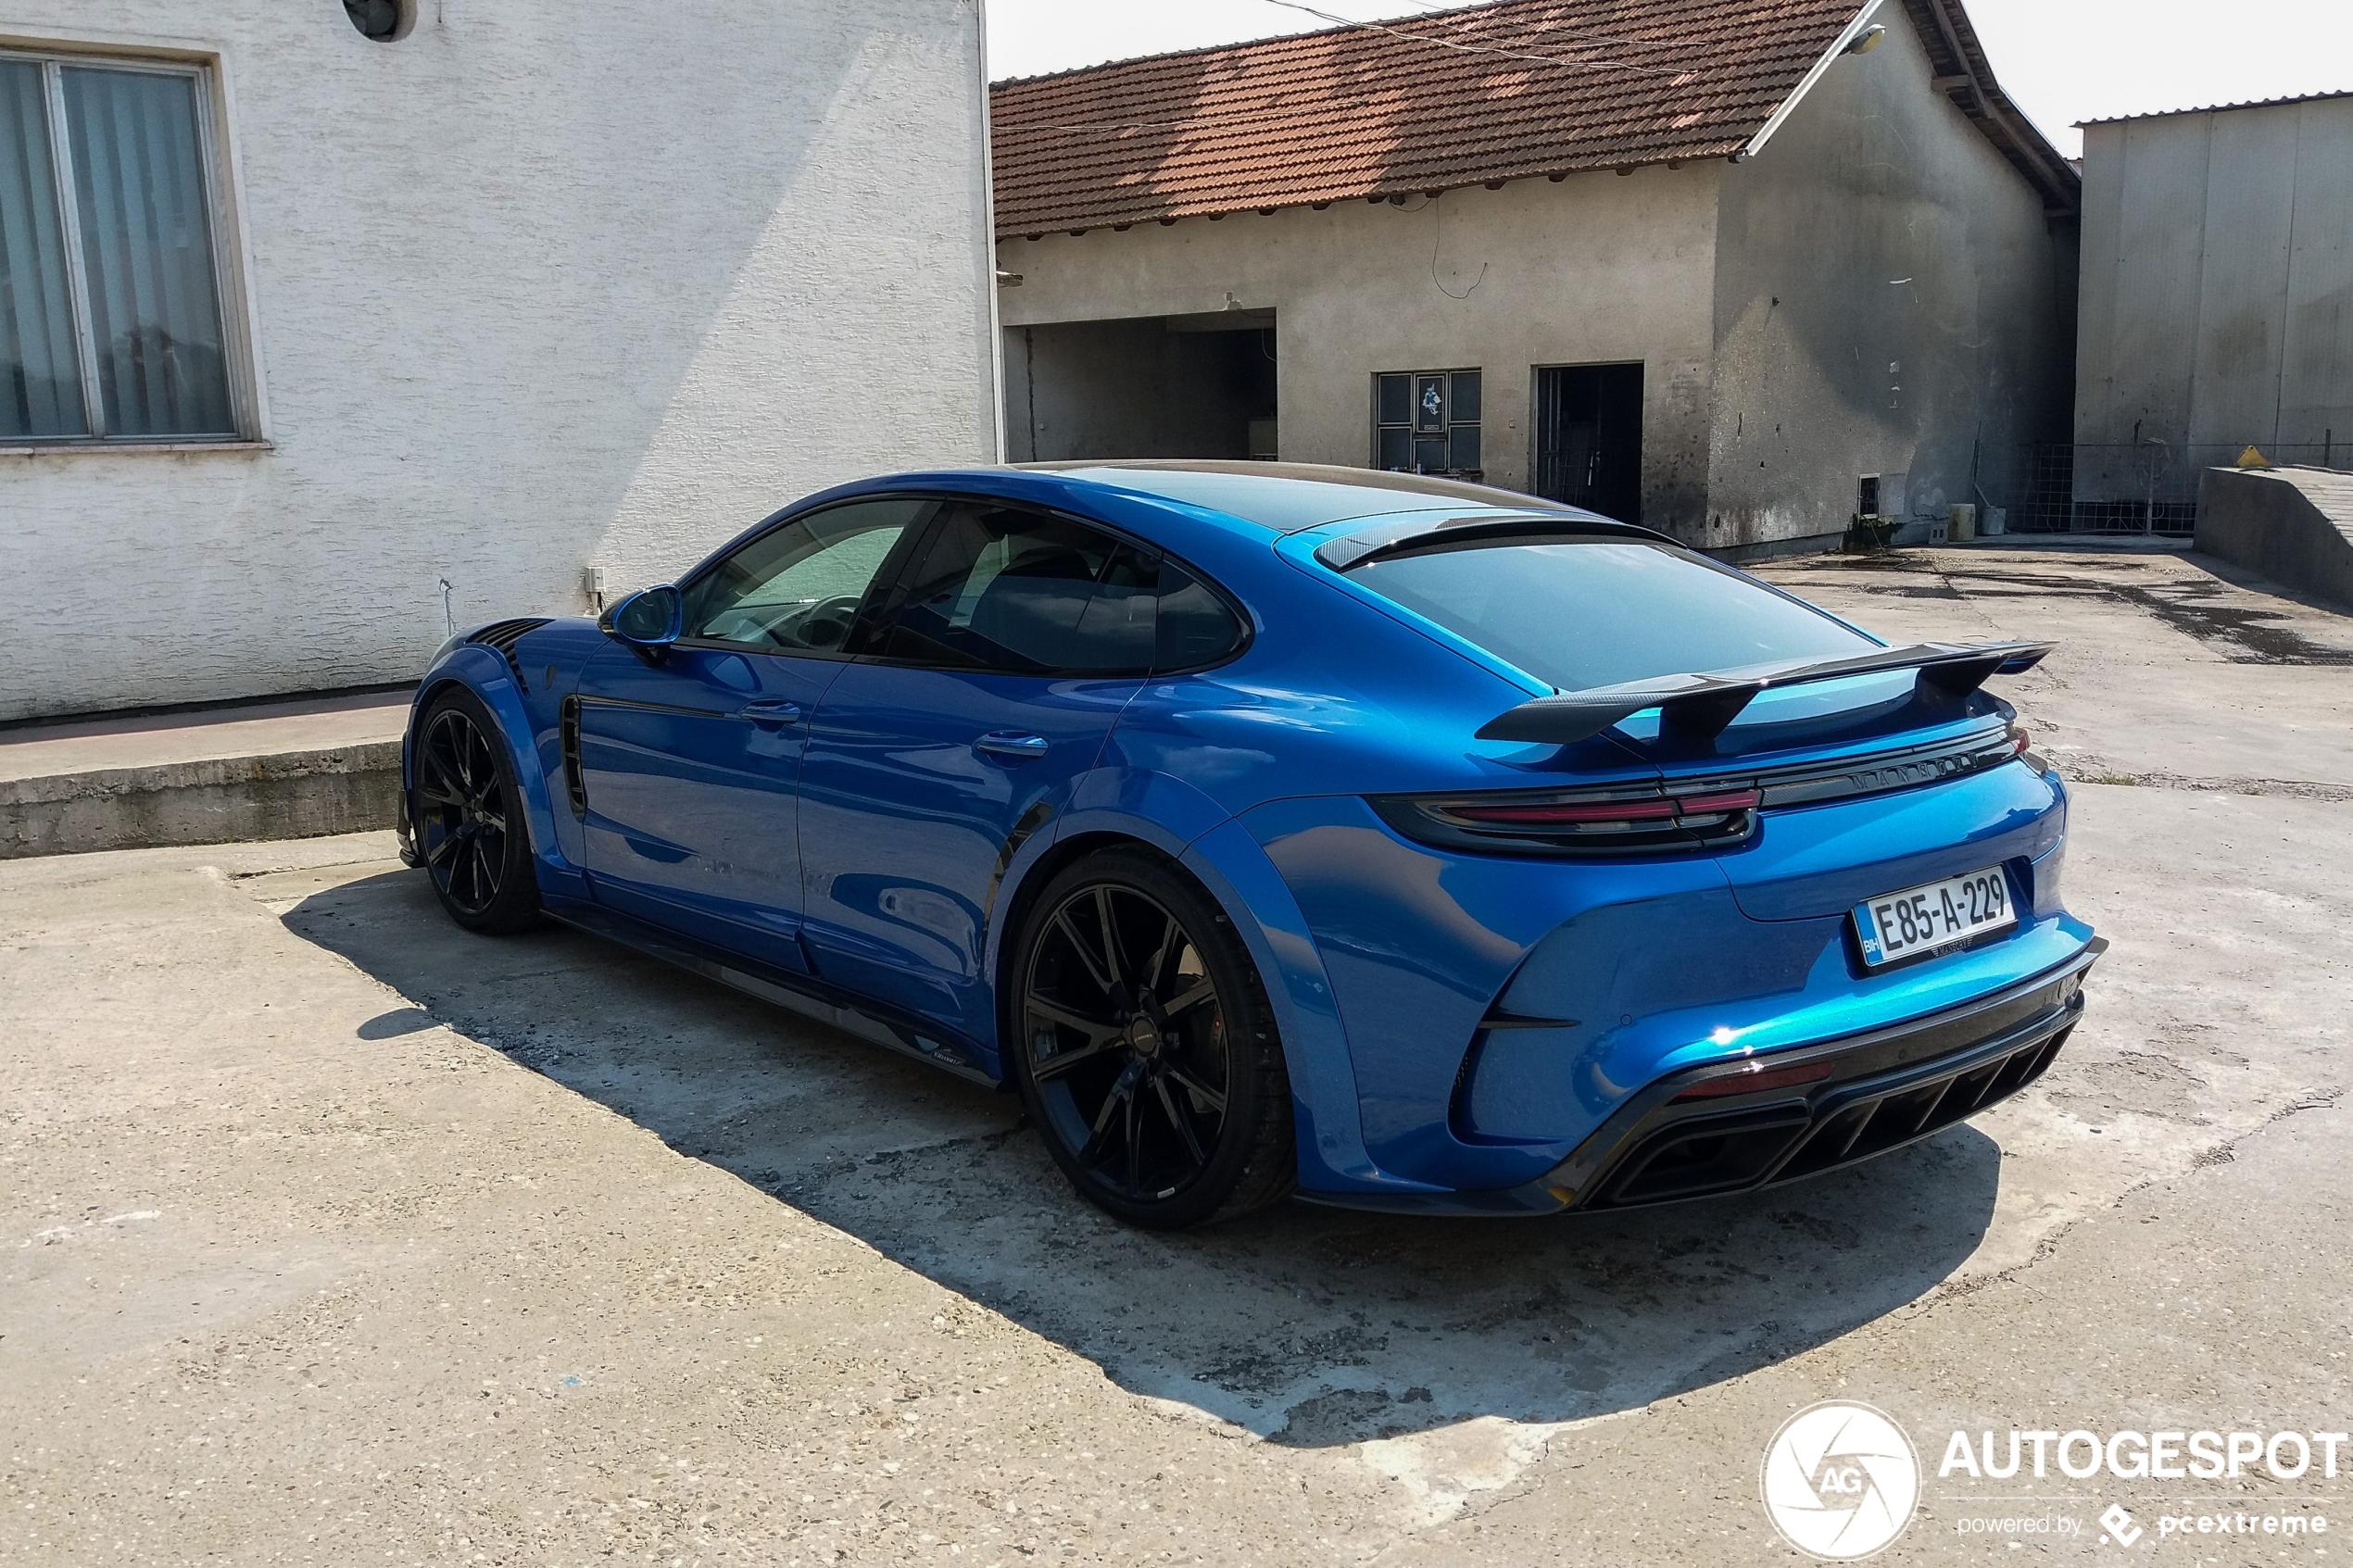 PorscheMansory 971 Panamera